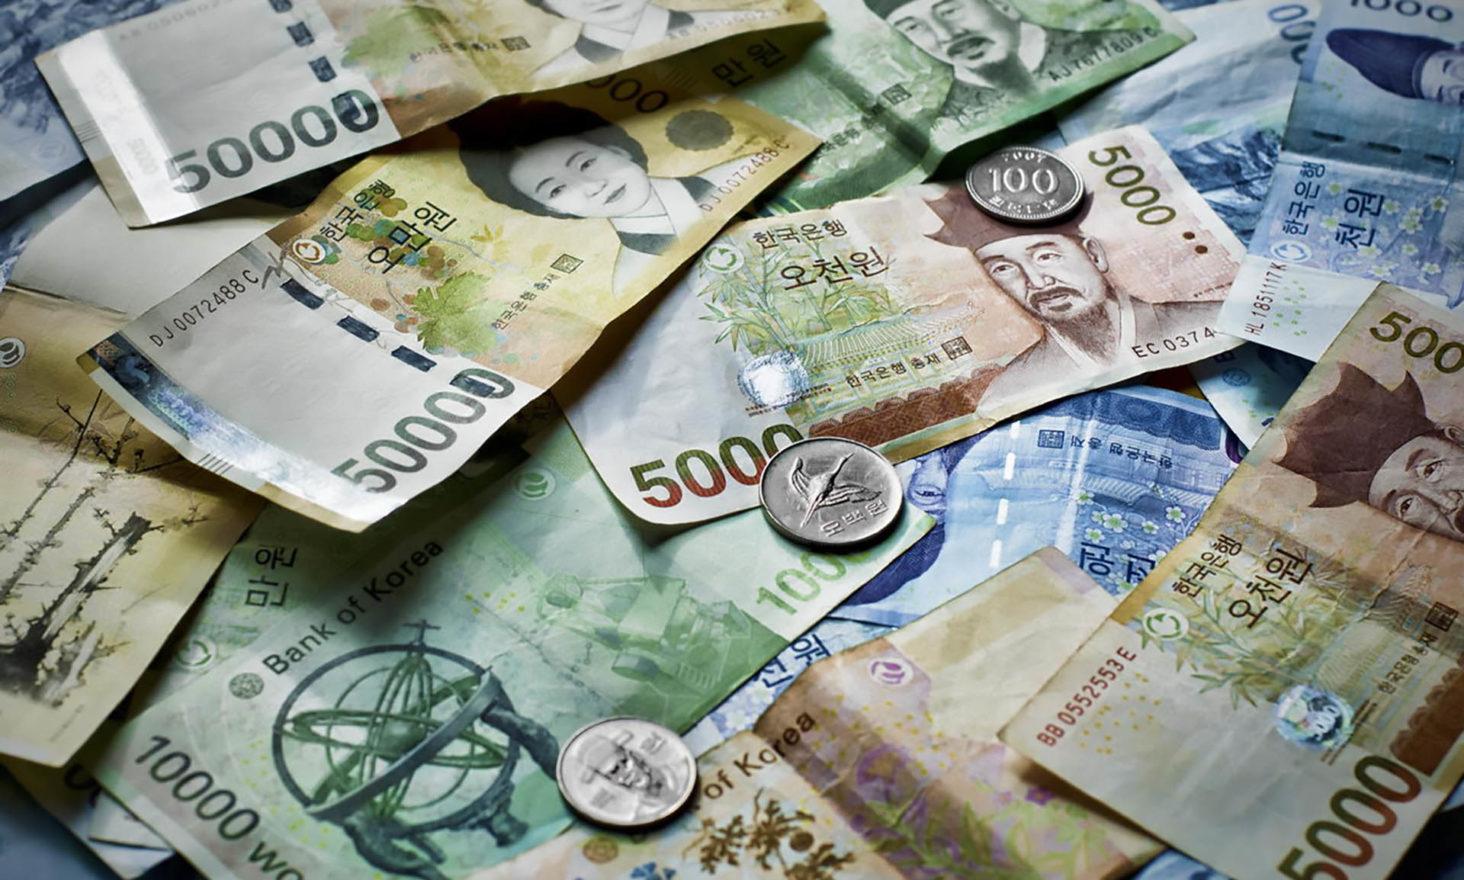 South Korea Exchange Bithumb Hacked For 'Tens Of Millions' Of Won